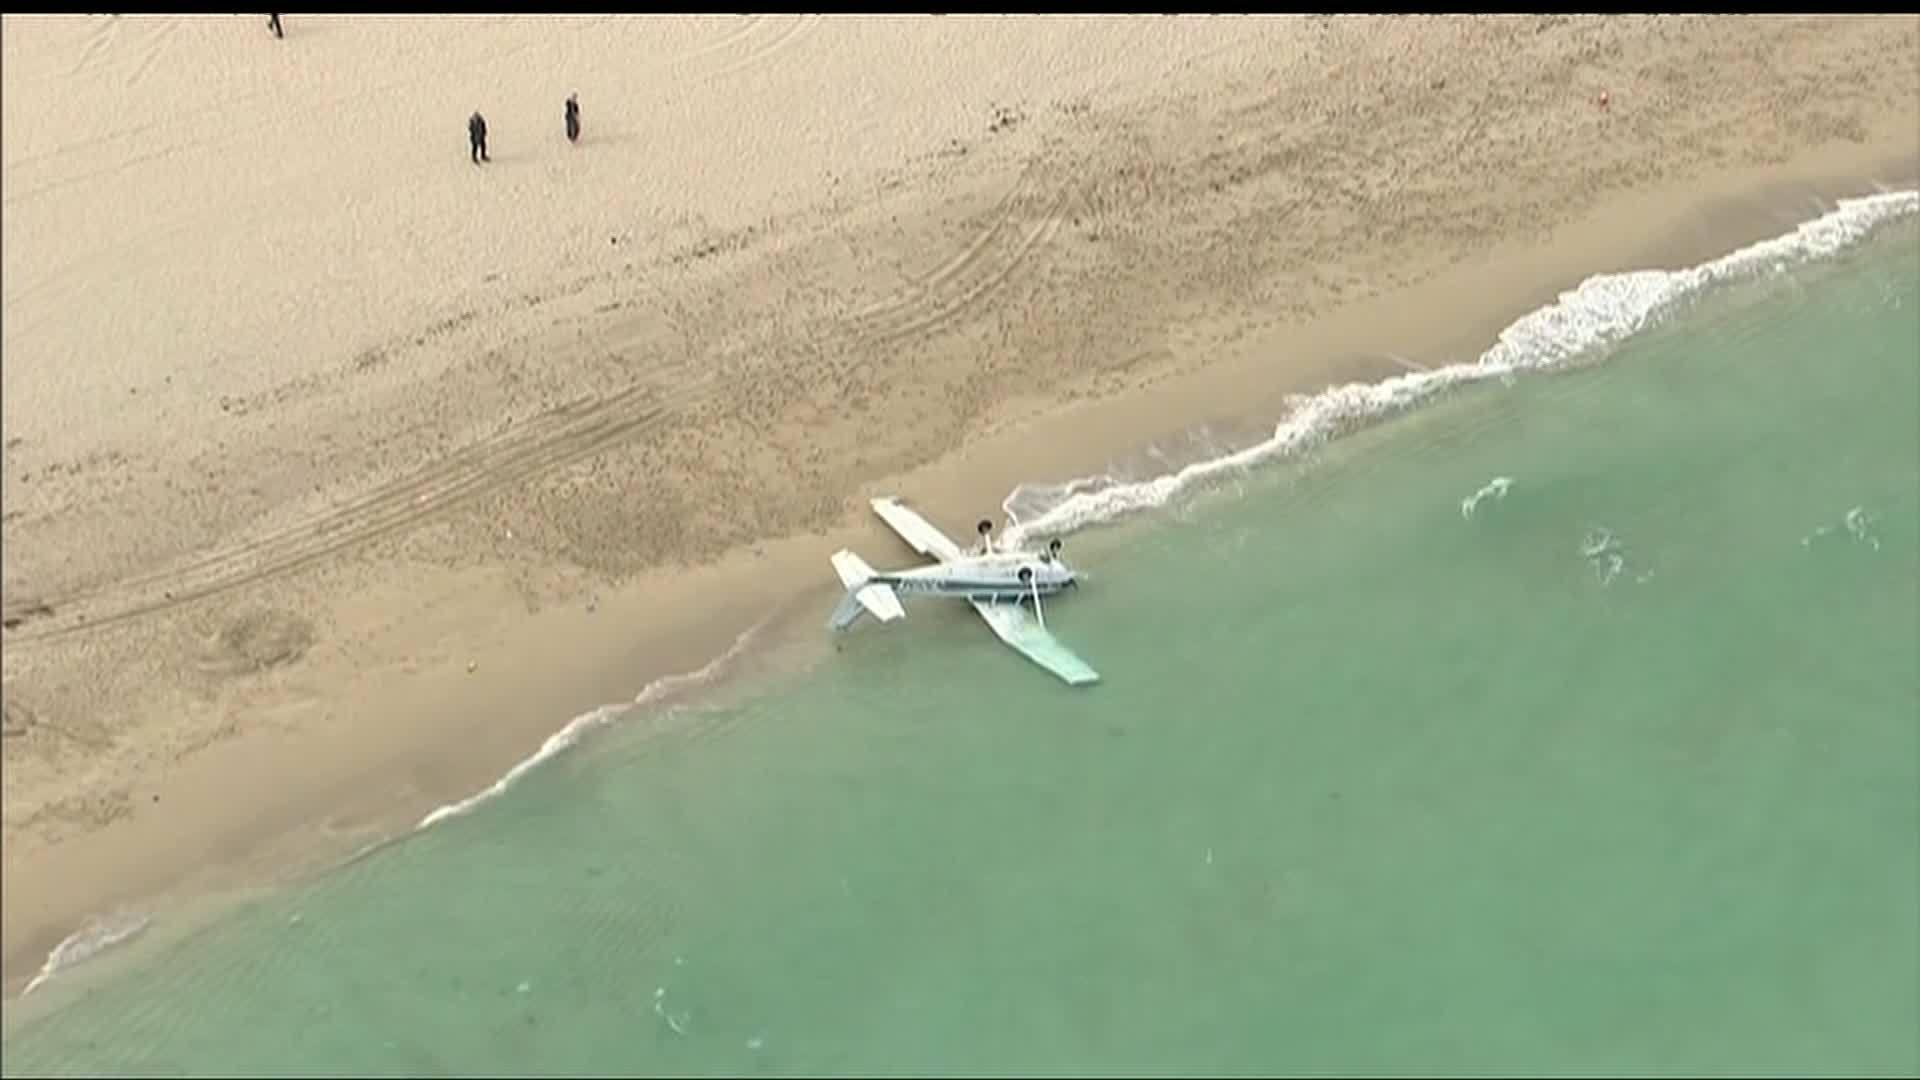 RAW_VIDEO__Scene_of_plane_crash_on_beach_8_20181224205258